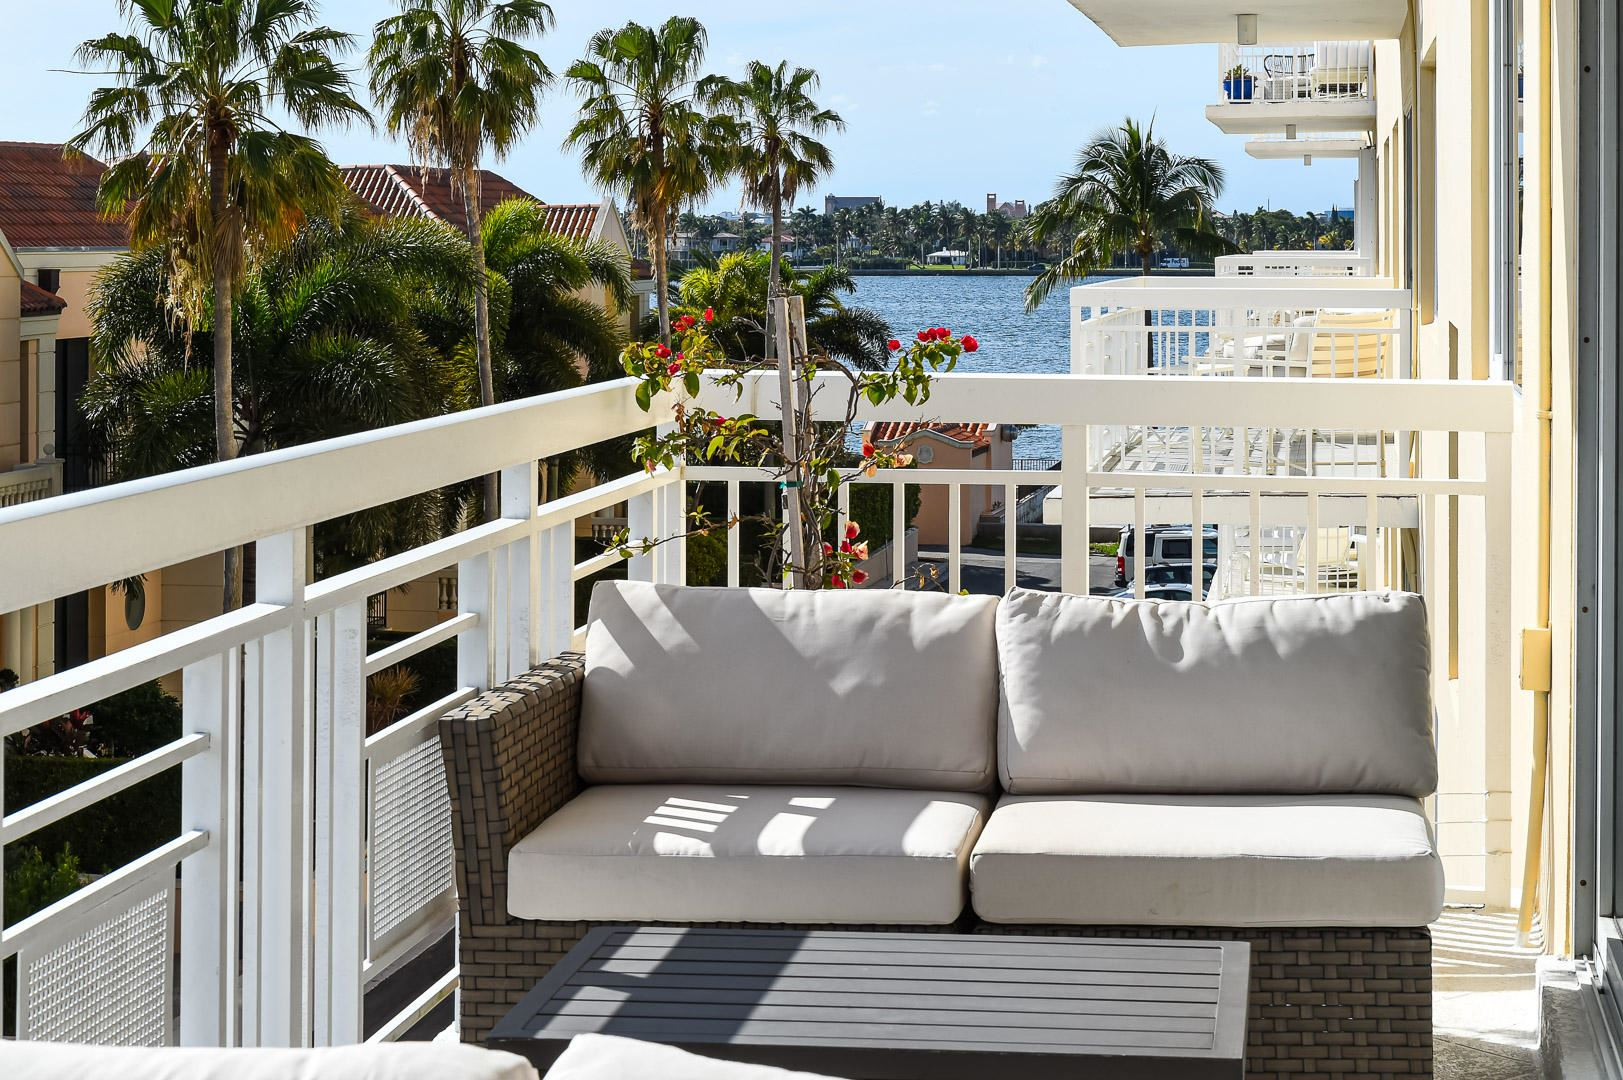 250 Bradley 402 Place #402, Palm Beach, FL 33480 - #: RX-10685752